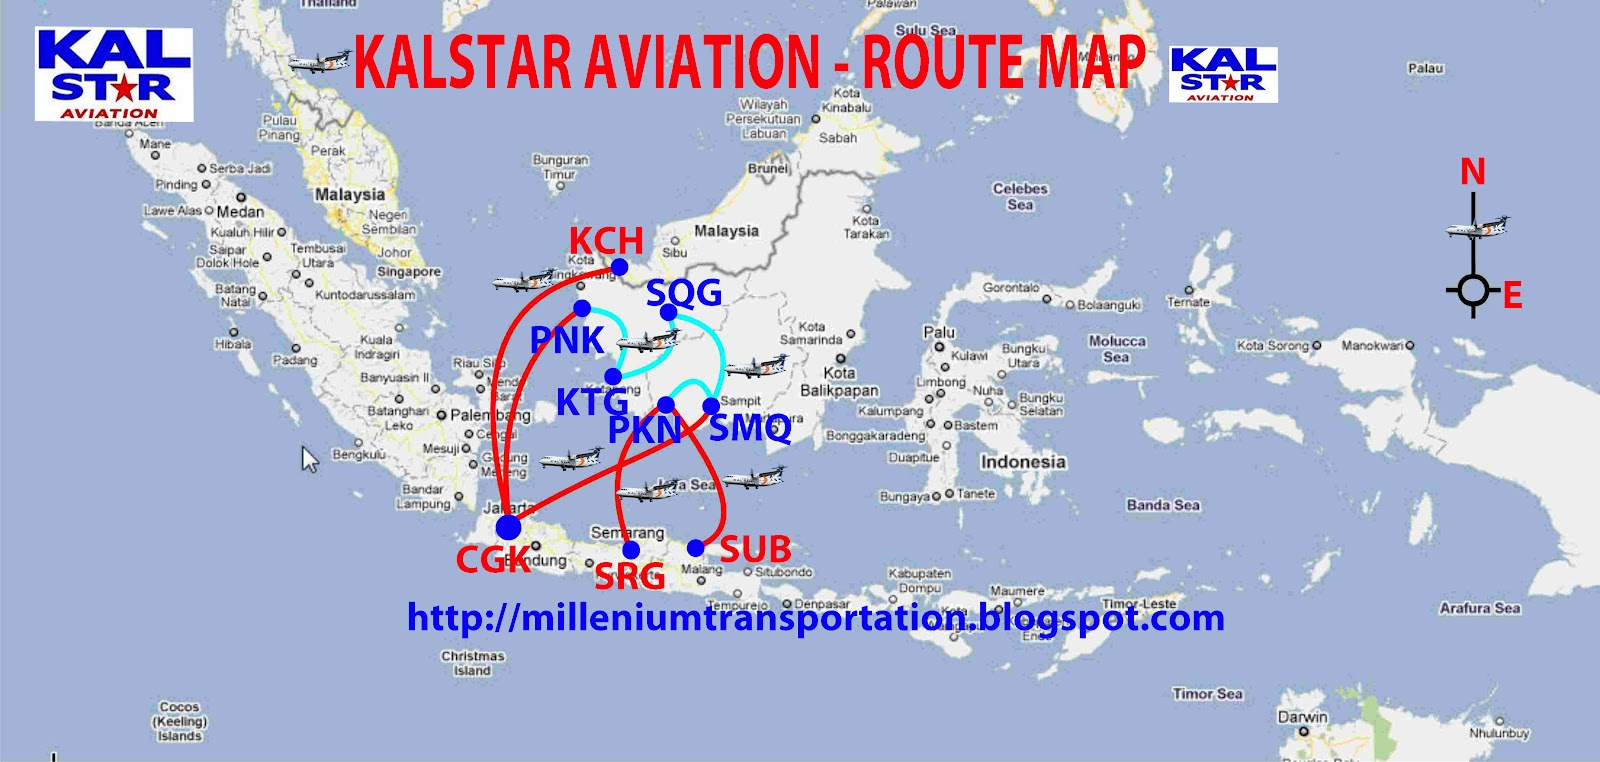 kalstar aviation routes map